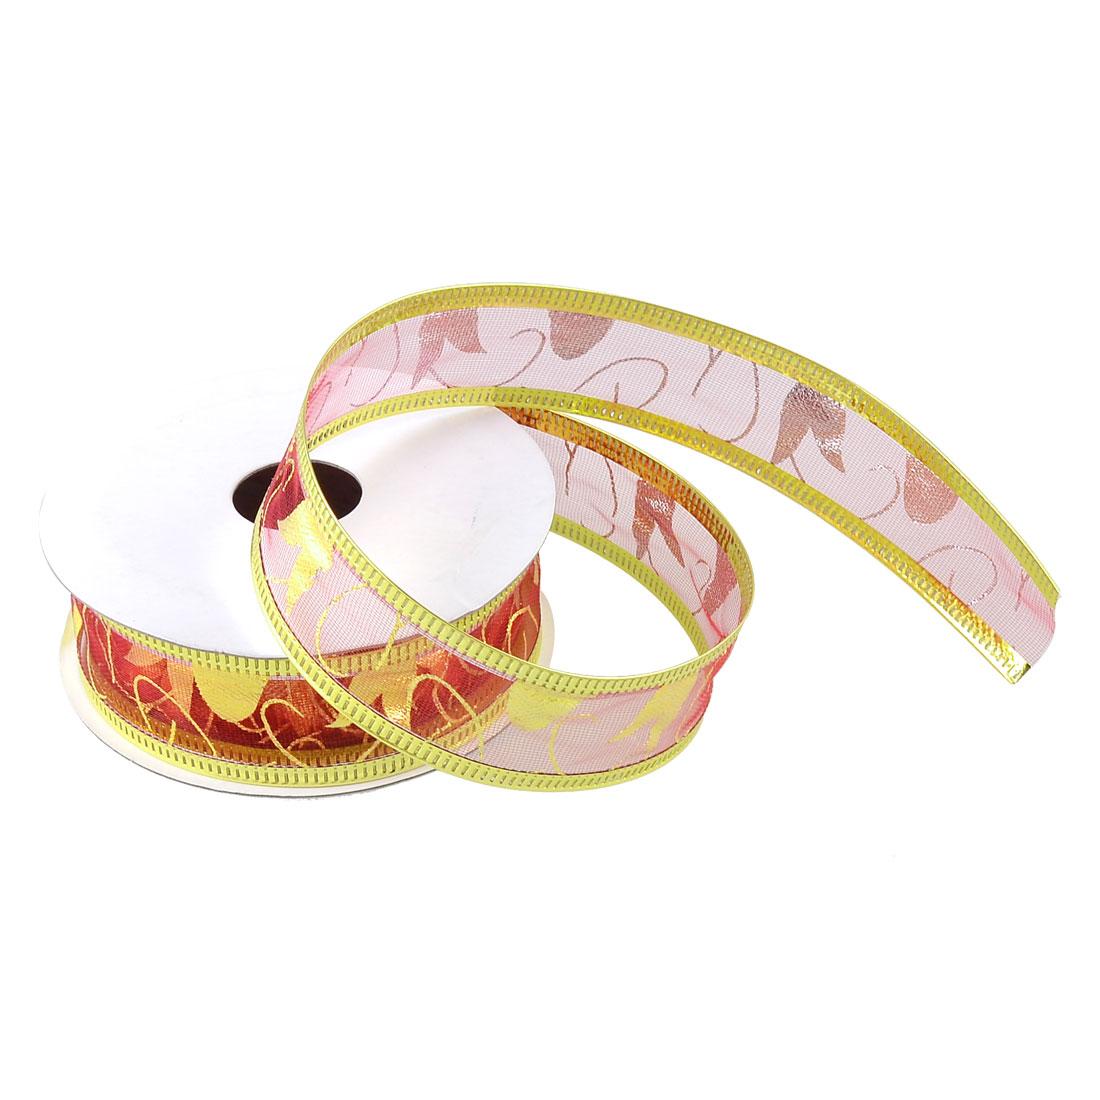 Wedding Christmas Decorative Burgundy Gold Tone Powder Nylon Ribbon Roll Tape